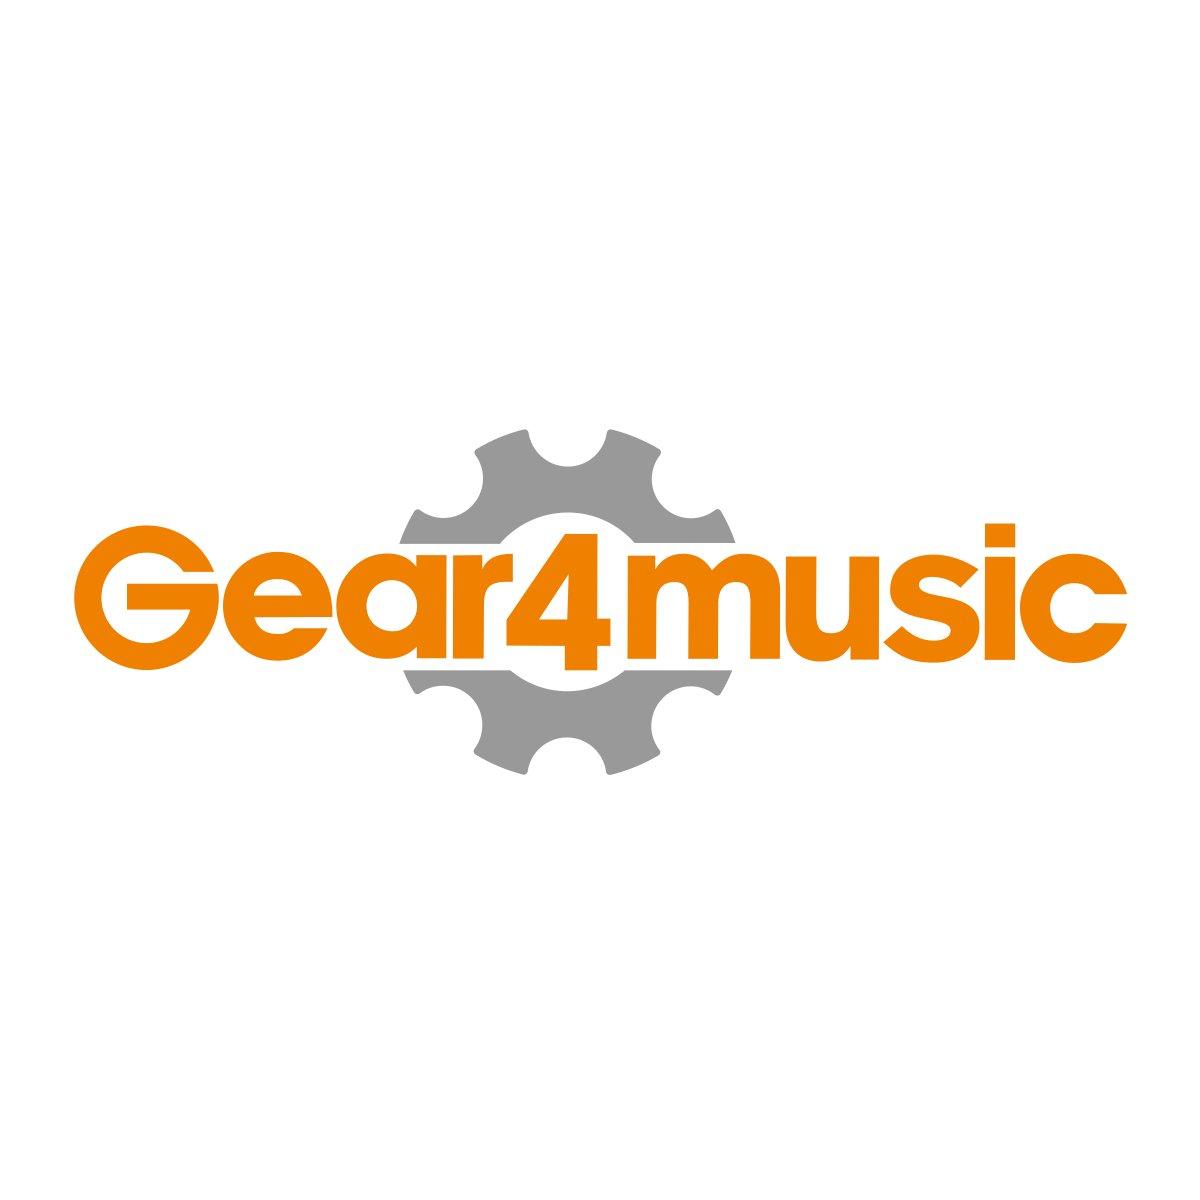 gear4music basso  Harlem Z basso by Gear4music, nero   Gear4music